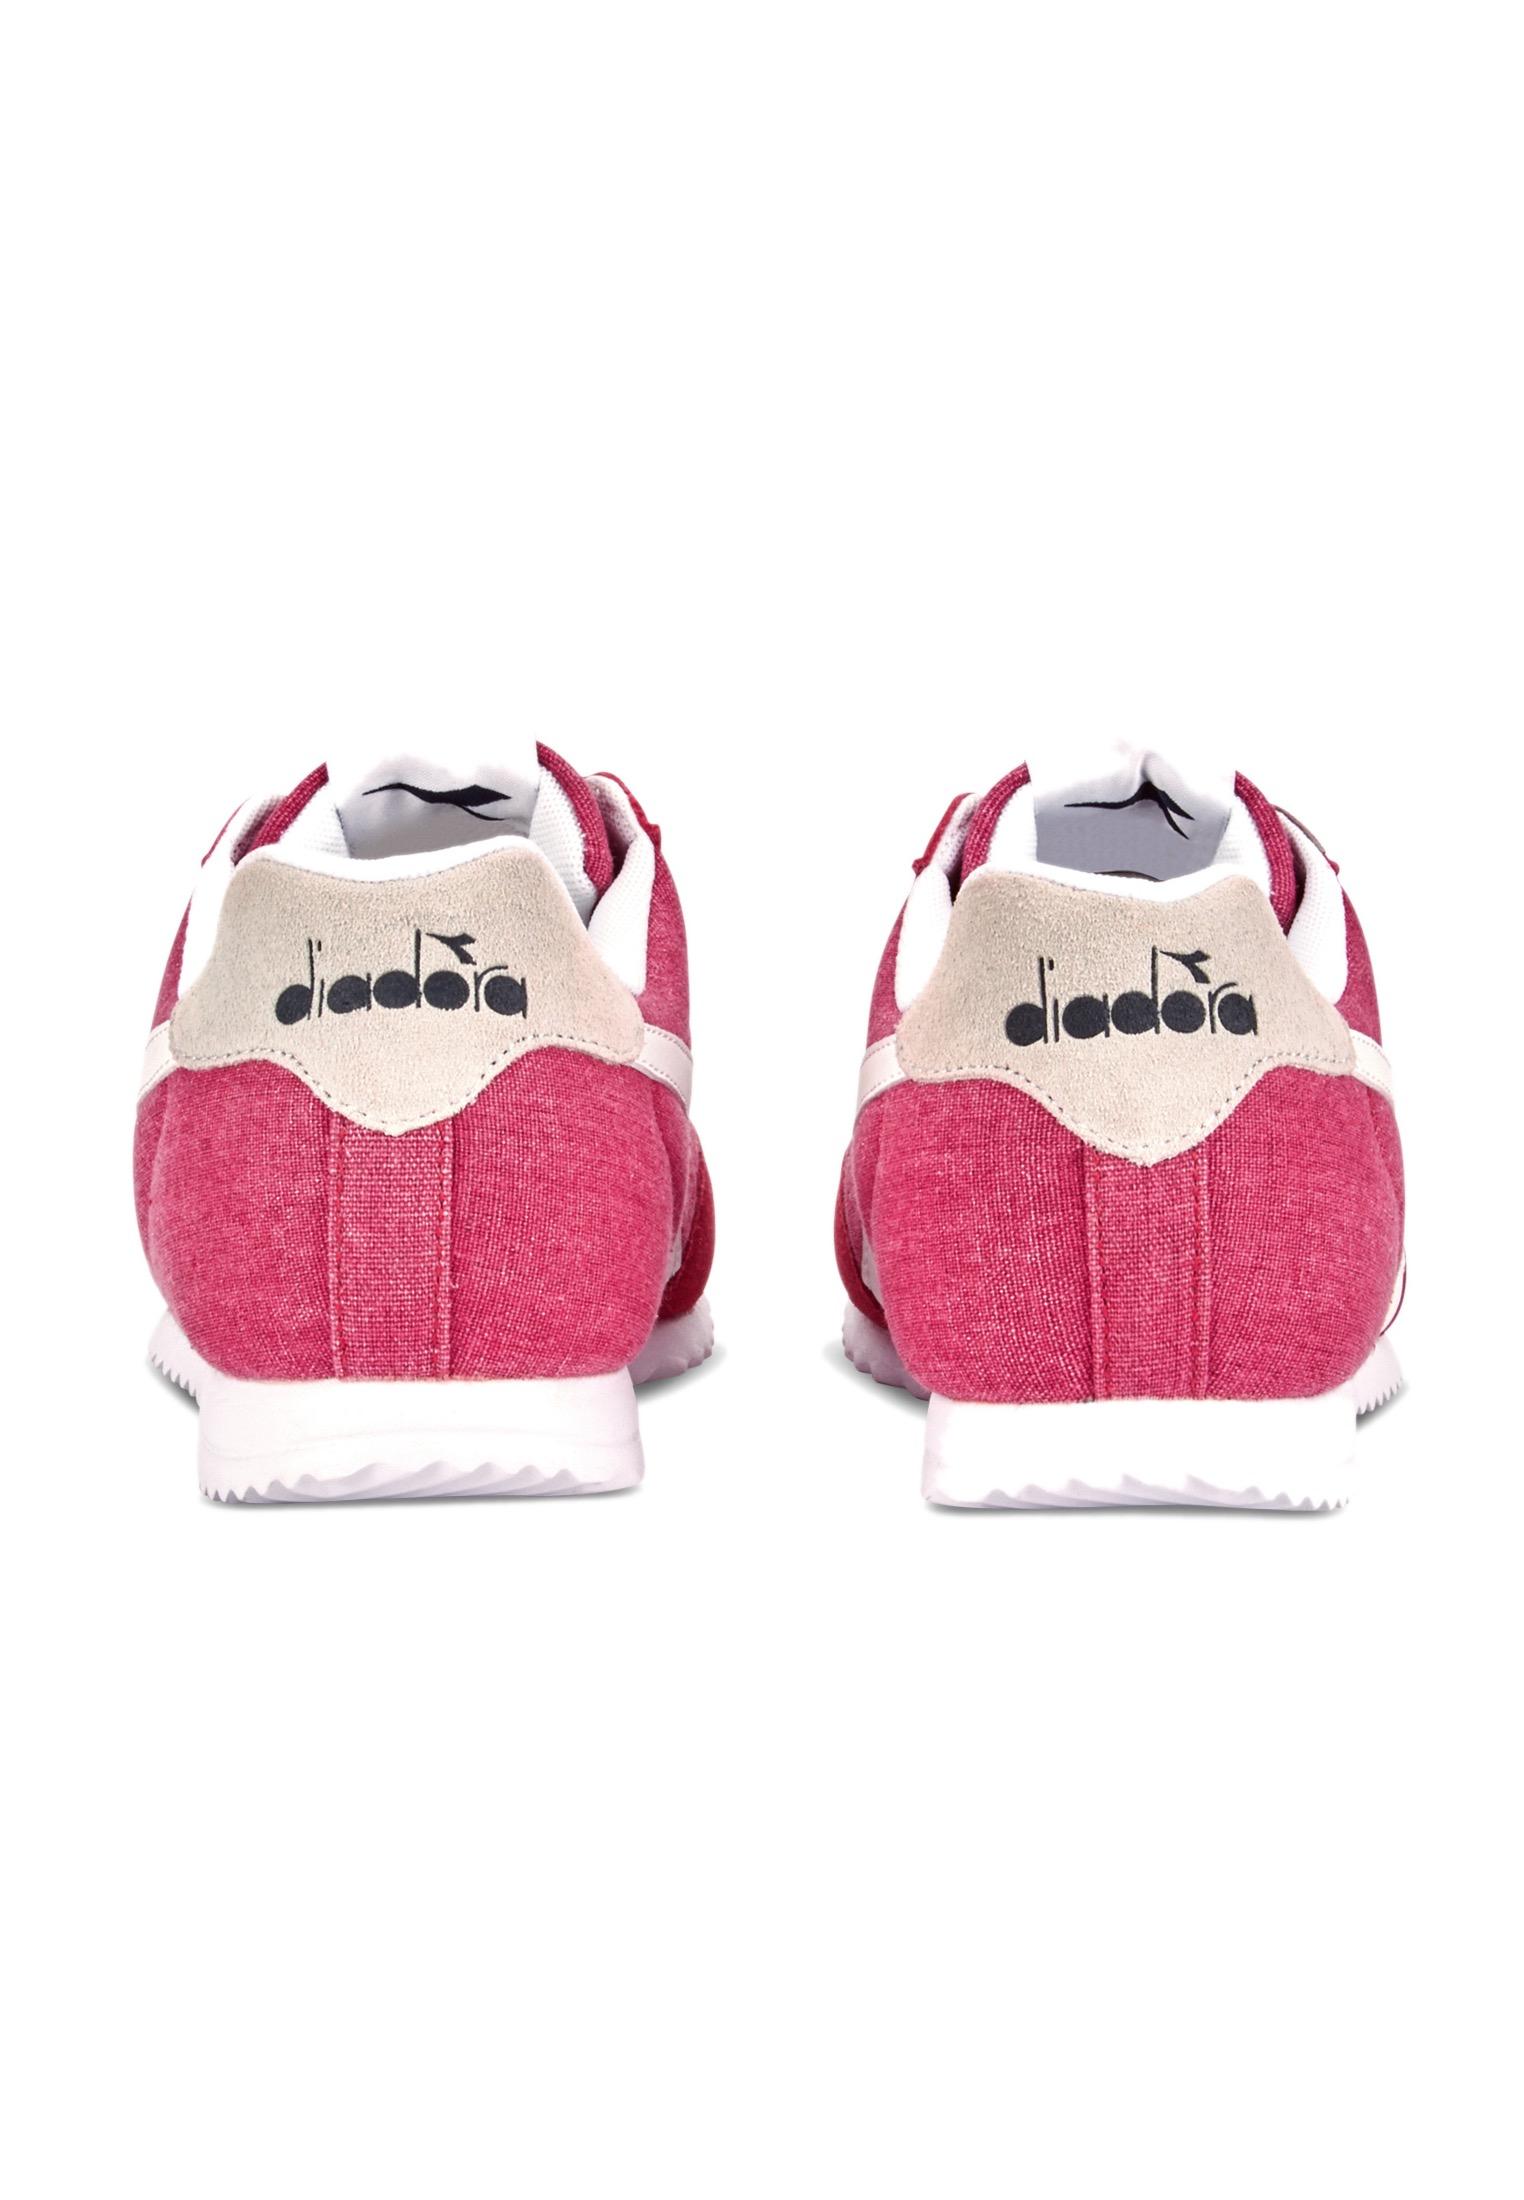 Scarpe-Diadora-Jog-Light-C-Sneakers-sportive-uomo-donna-vari-colori-e-taglie miniatura 6